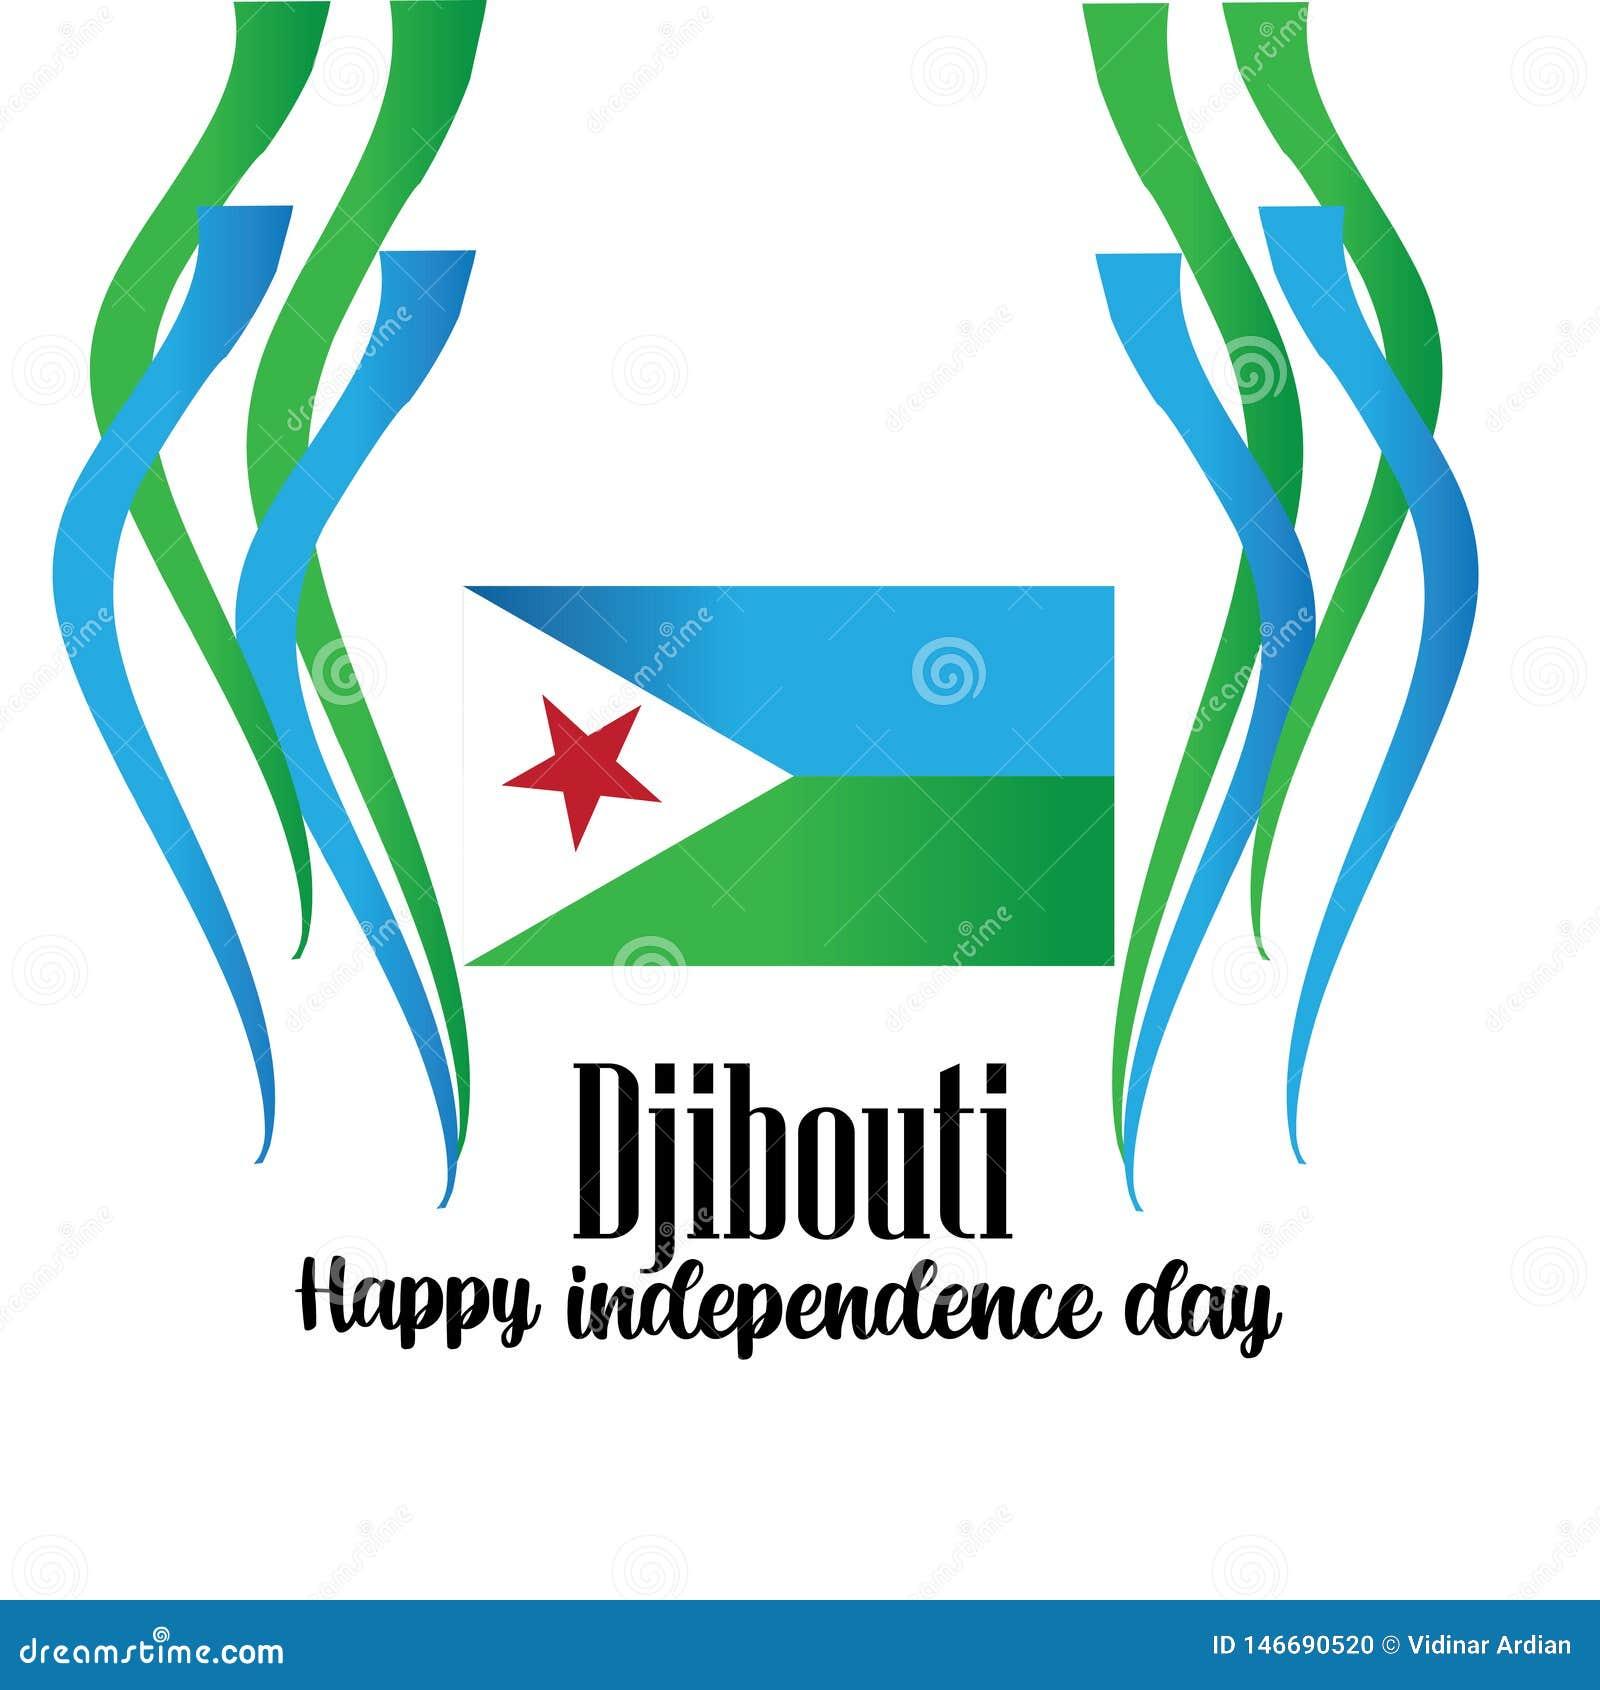 Vektorillustration av en bakgrund f?r Djibouti sj?lvst?ndighetsdagendesign - Mappen f?r vektorn